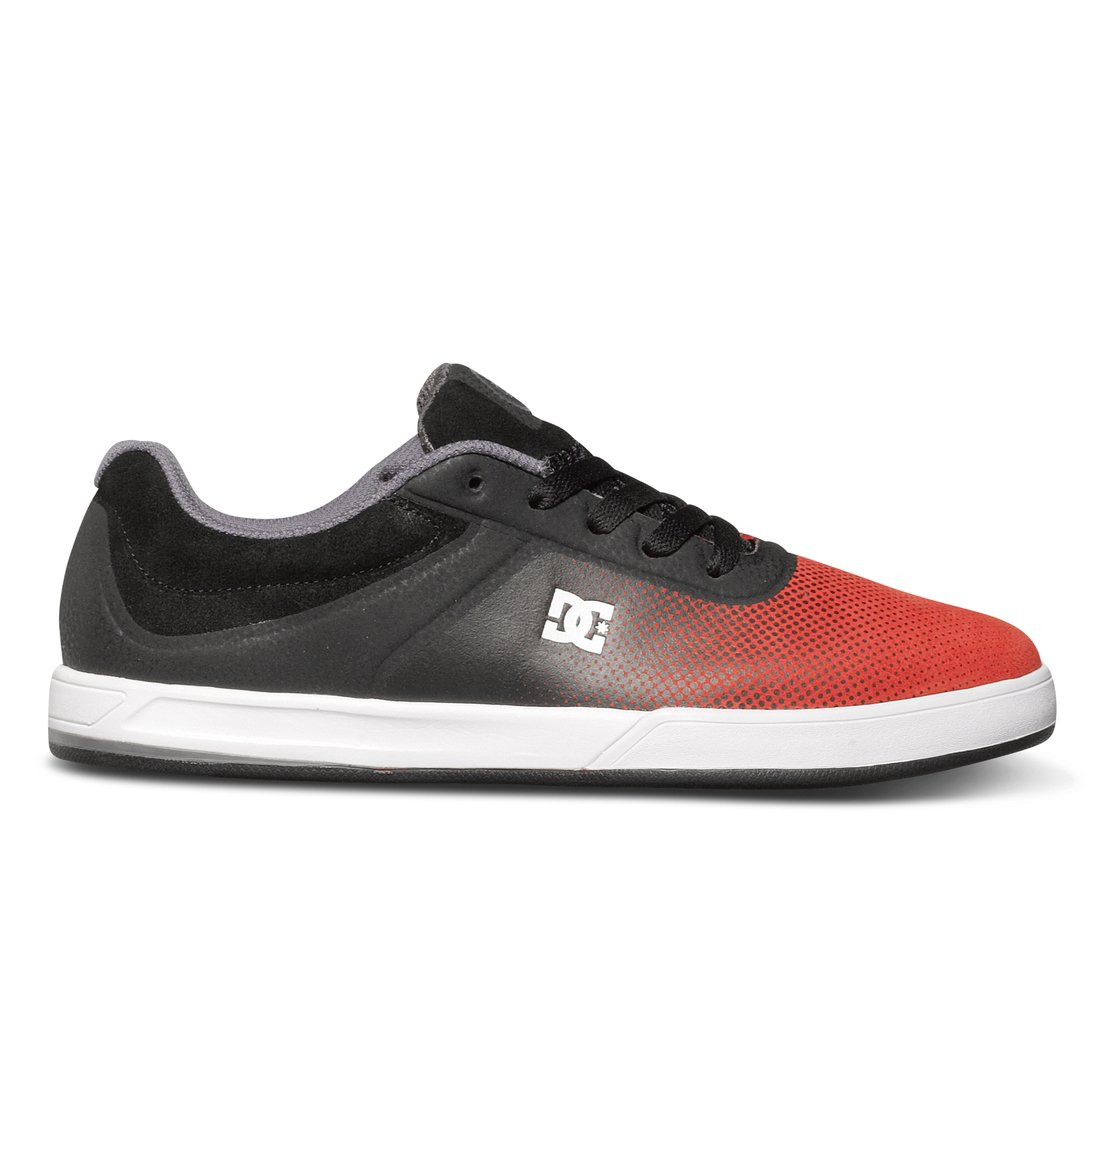 Skate shoes jakarta - 0 Men S Mike Mo Capaldi S Shoes 320175 Dc Shoes